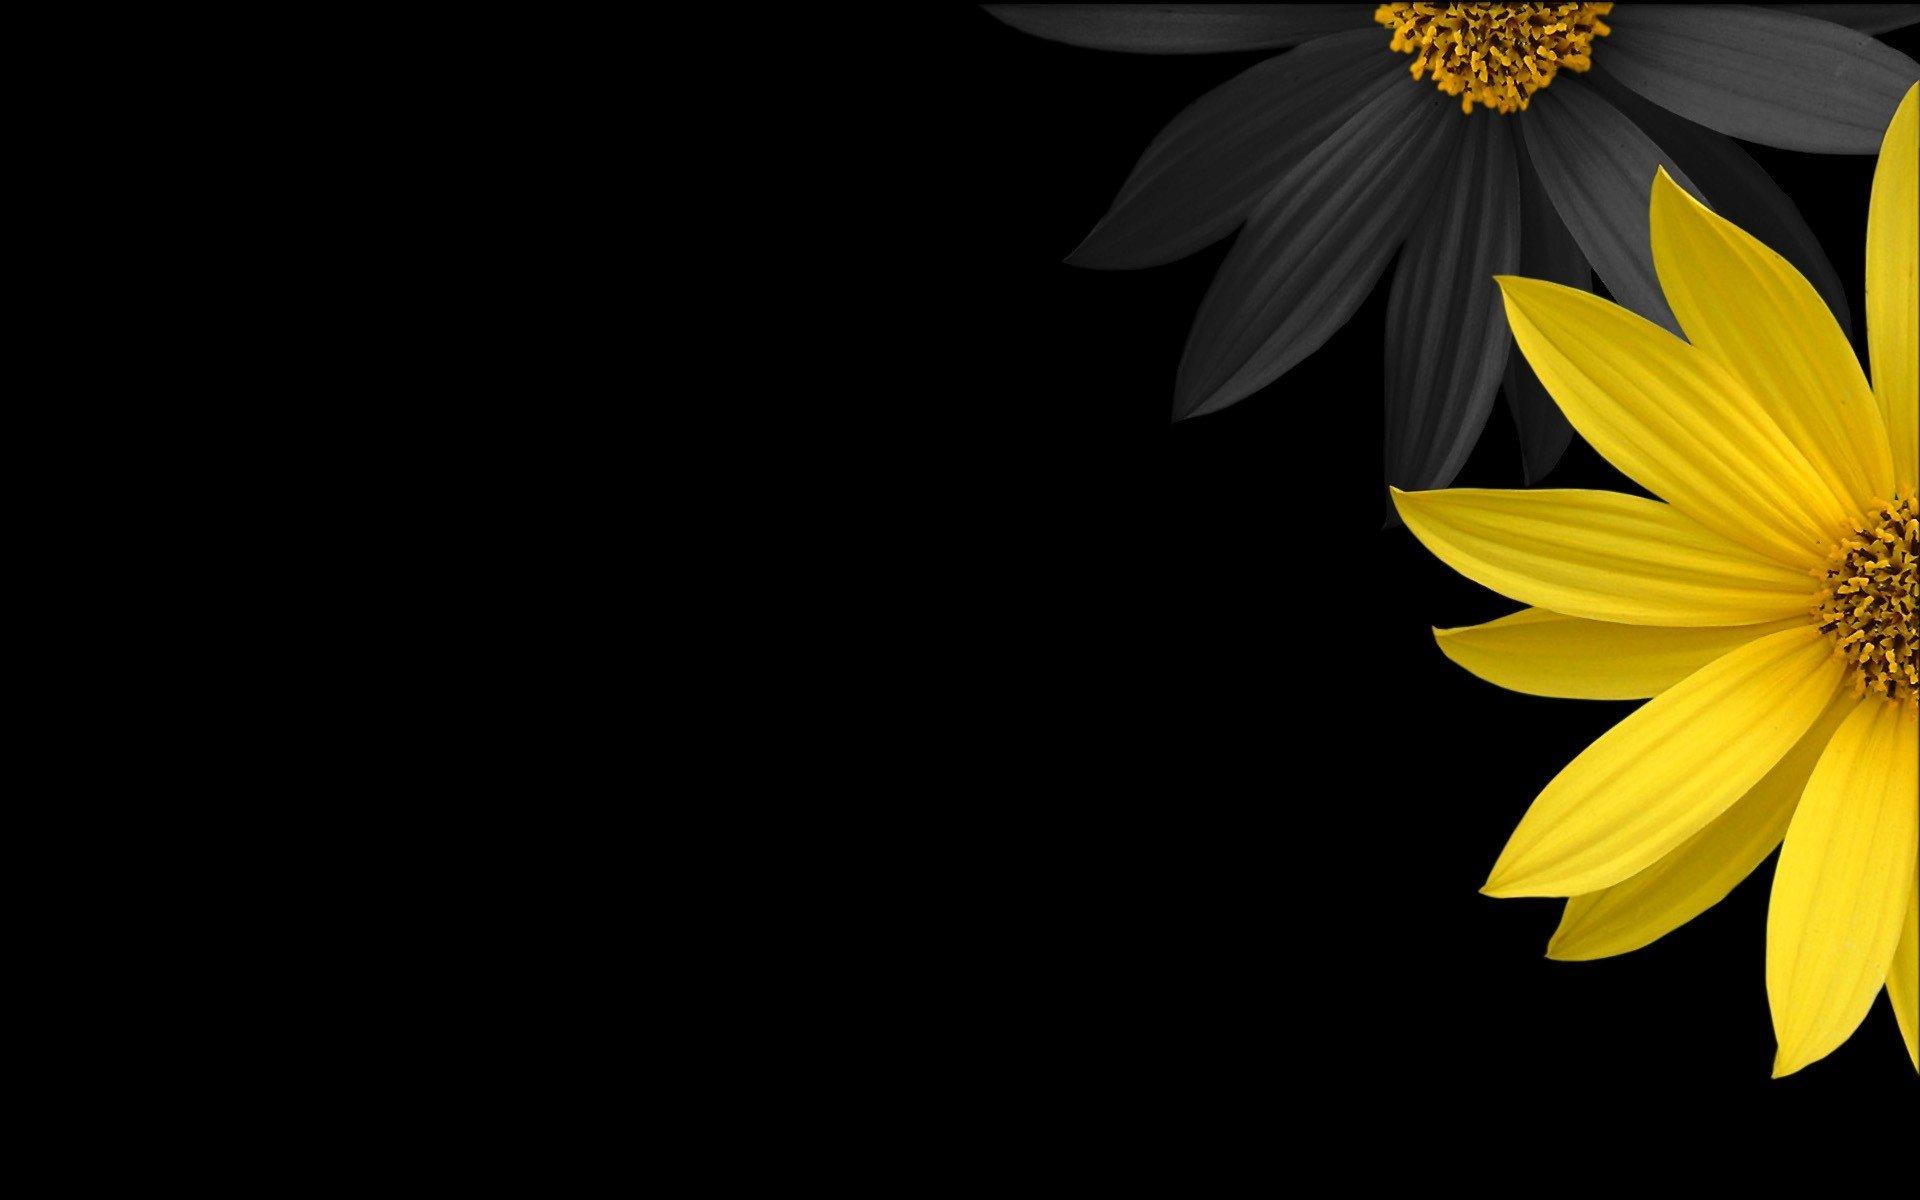 1920x1200 px background black flower minimalistic petals yellow 1530309